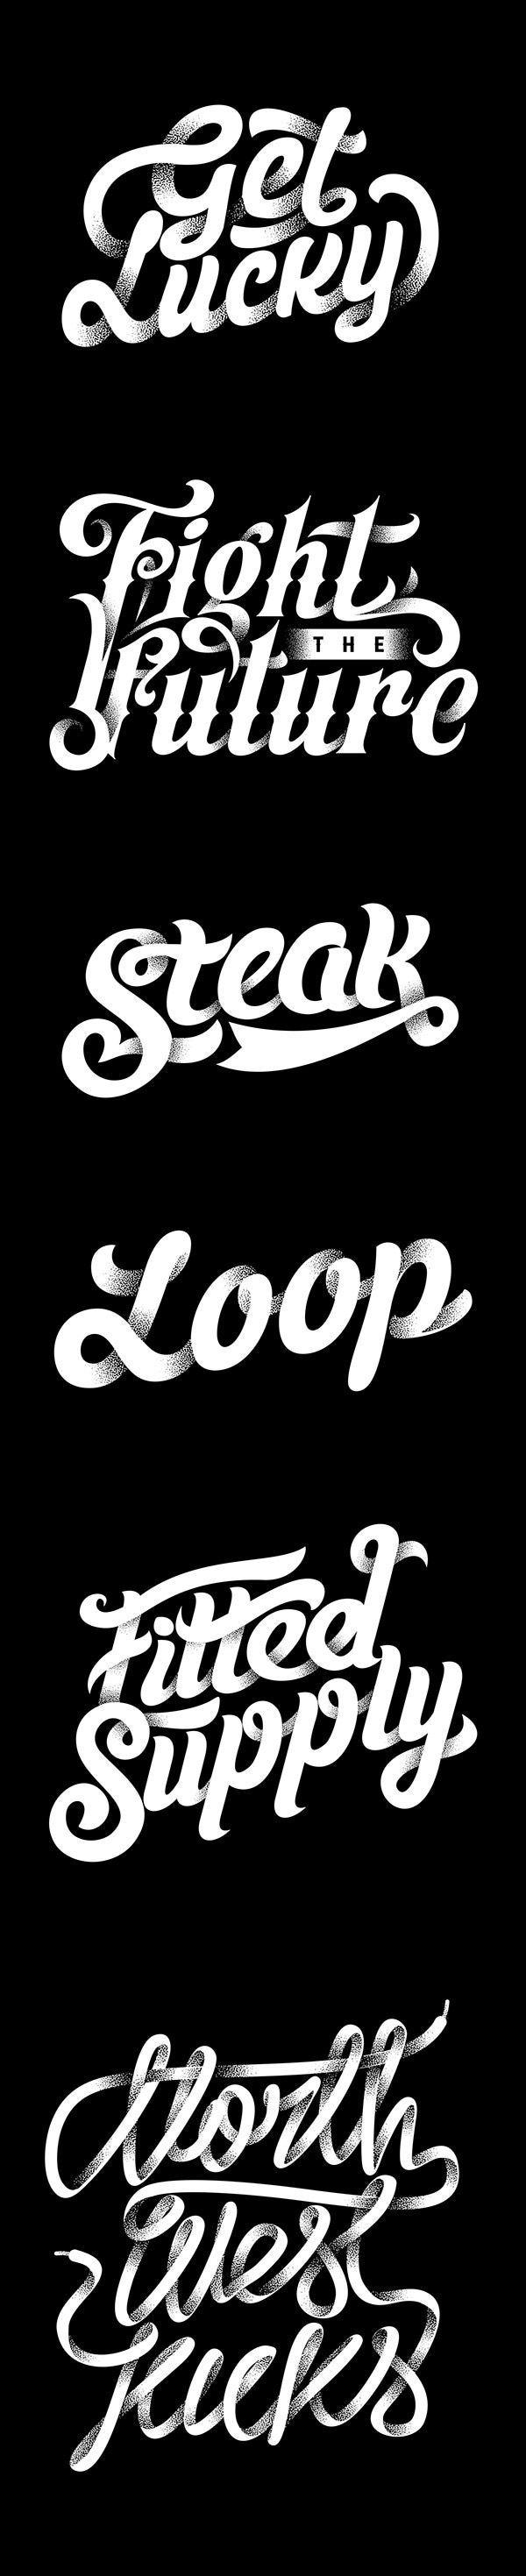 Typography | Endofyear Typework by Rakhmat Jaka Perkasa